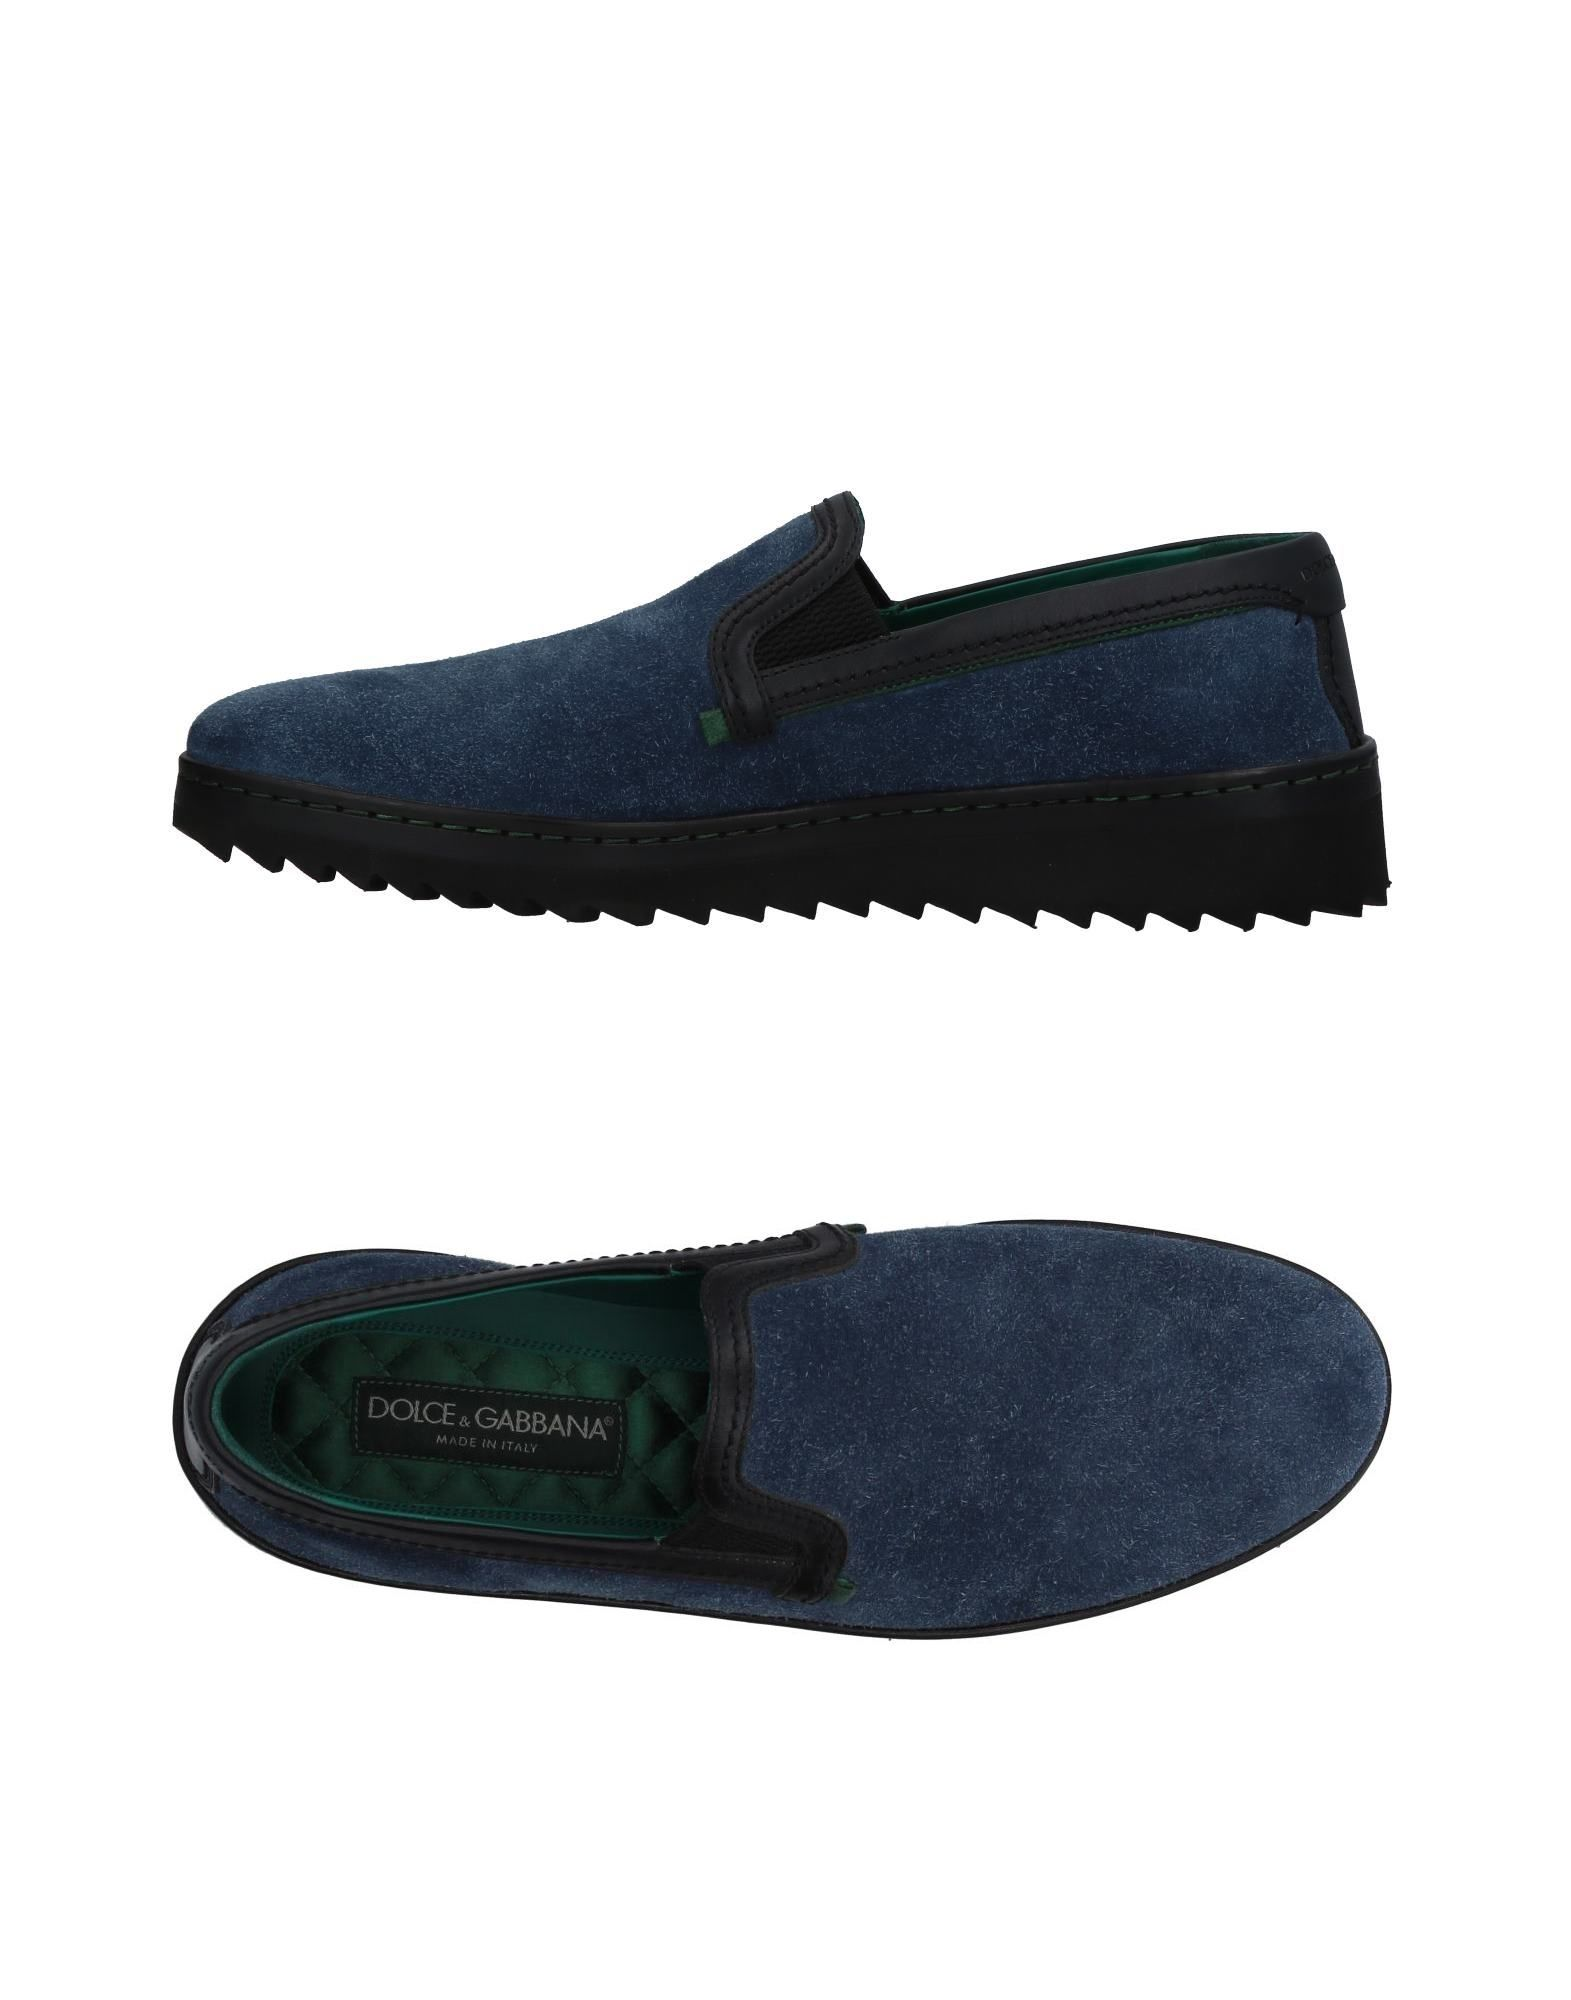 Sneakers Dolce & Gabbana Homme - Sneakers Dolce & Gabbana sur